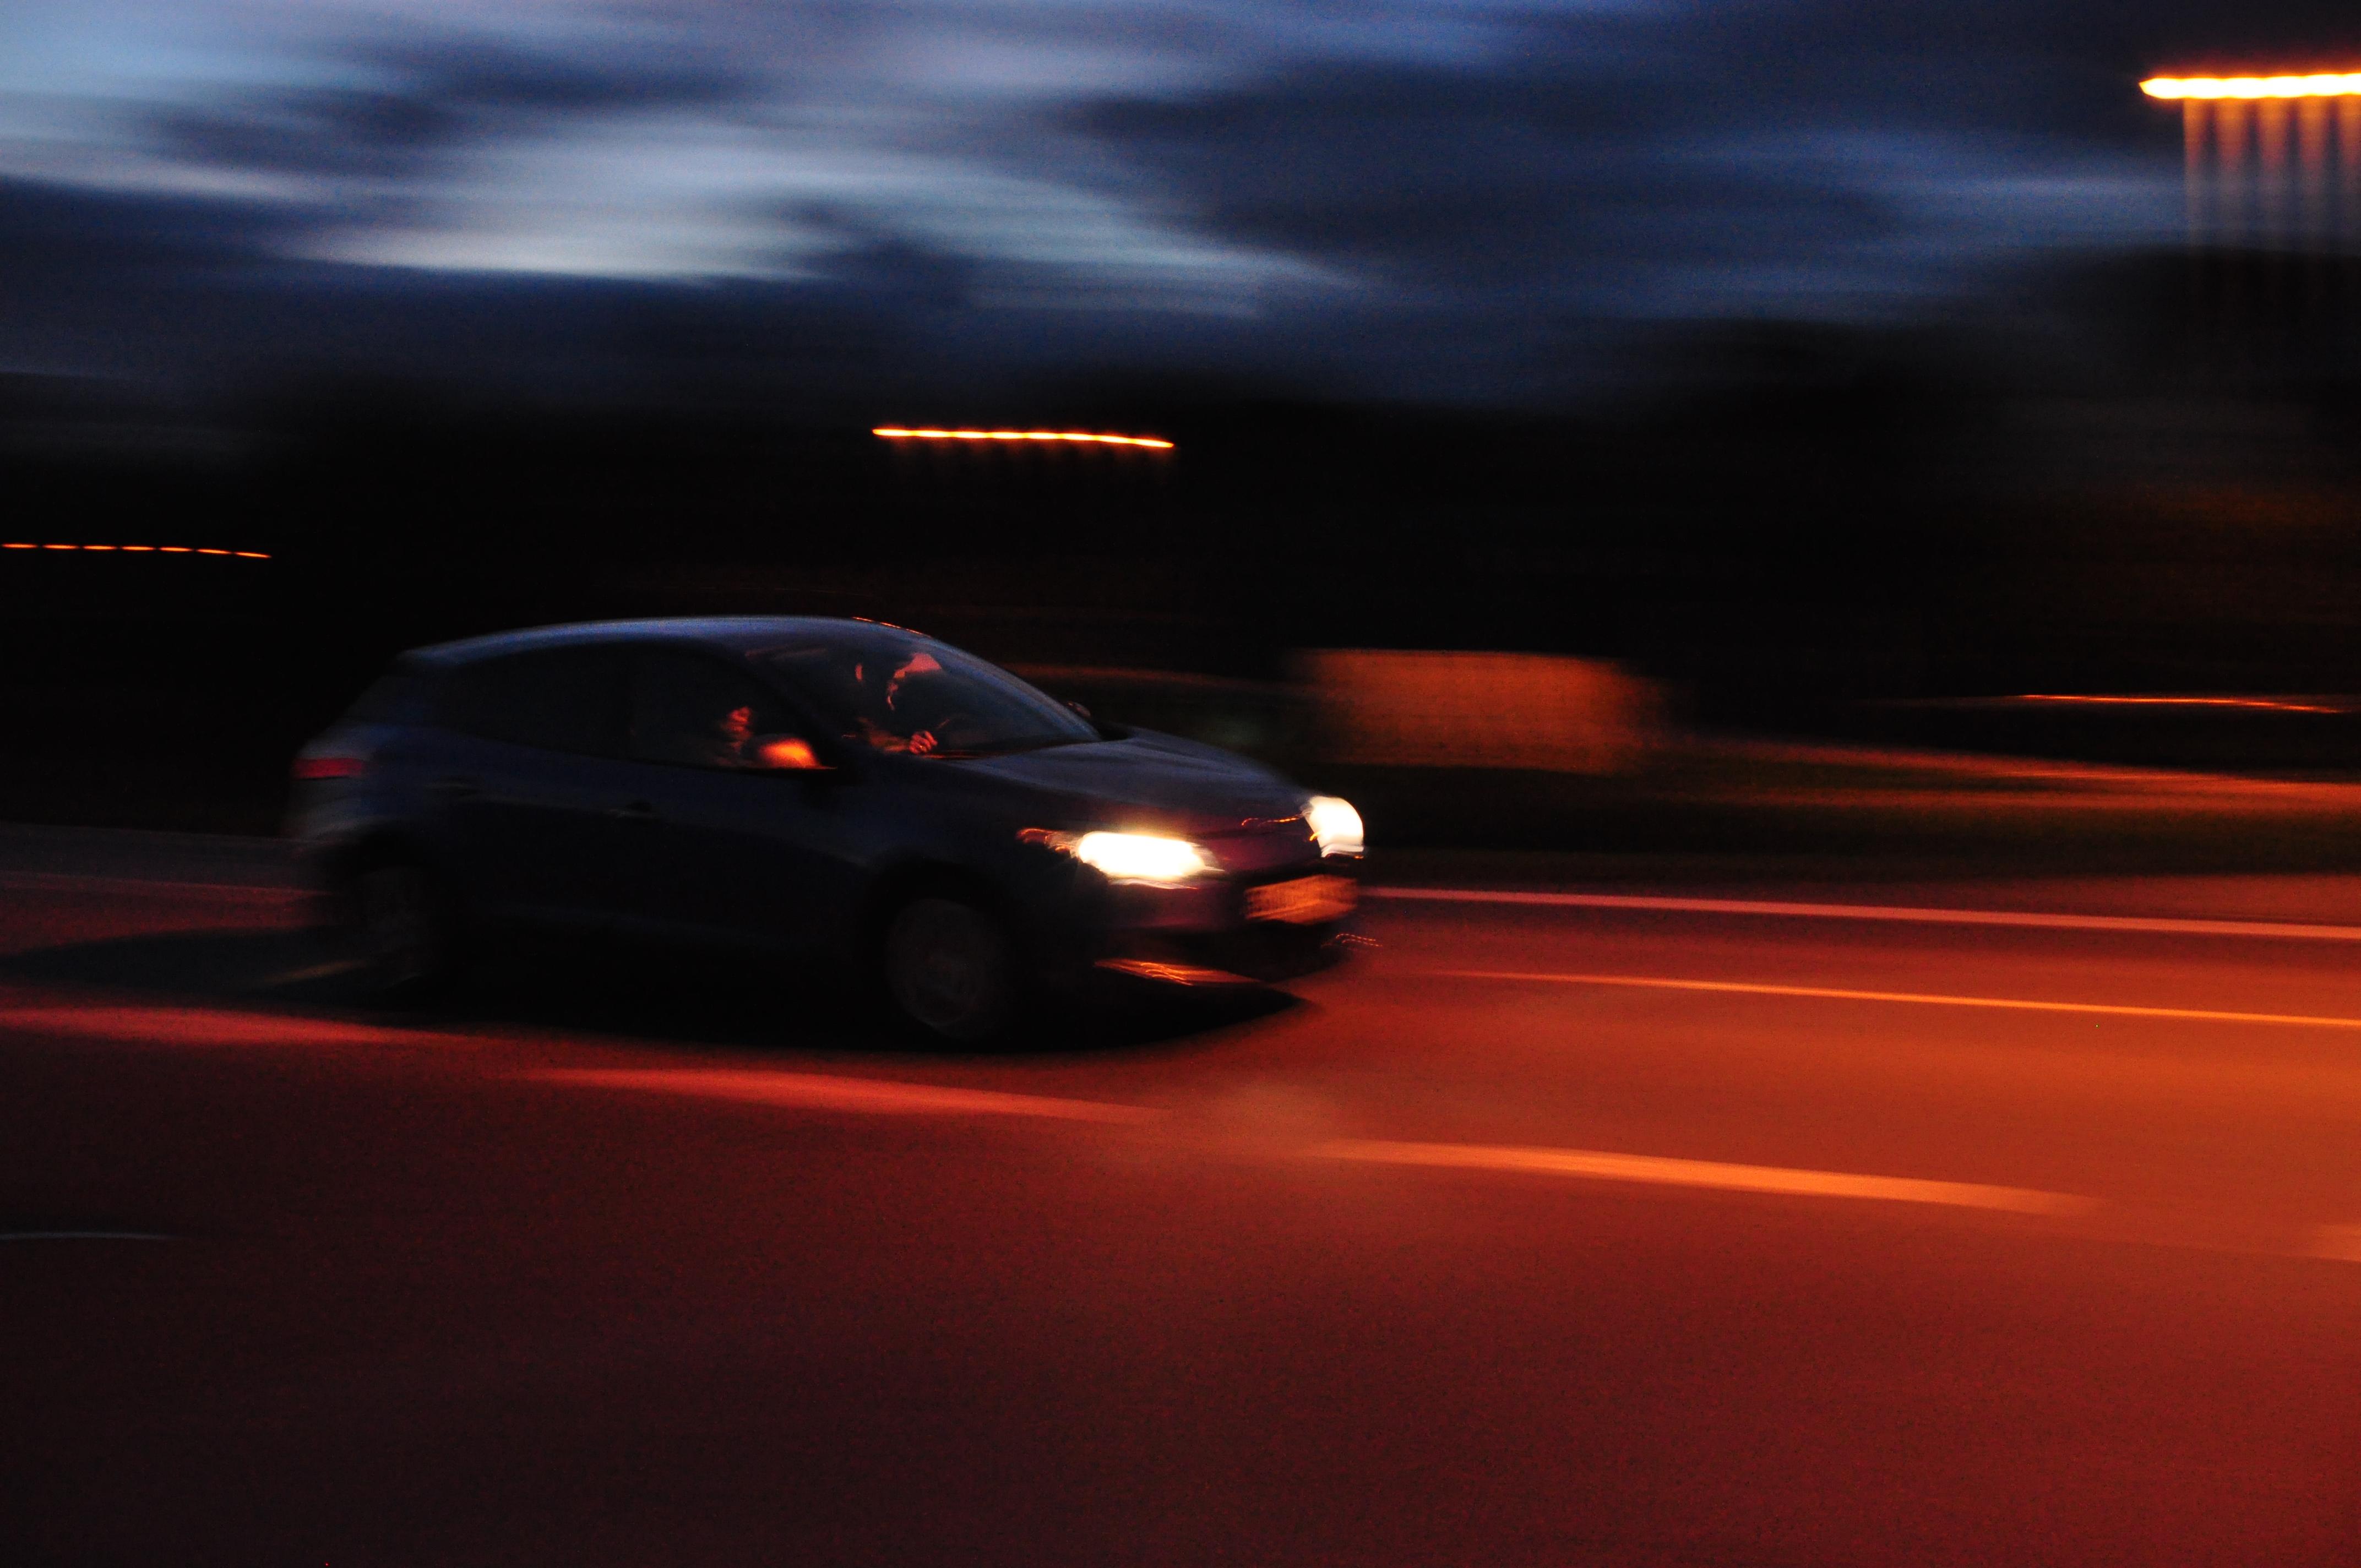 Speedy Car At Night Cc0 Photo